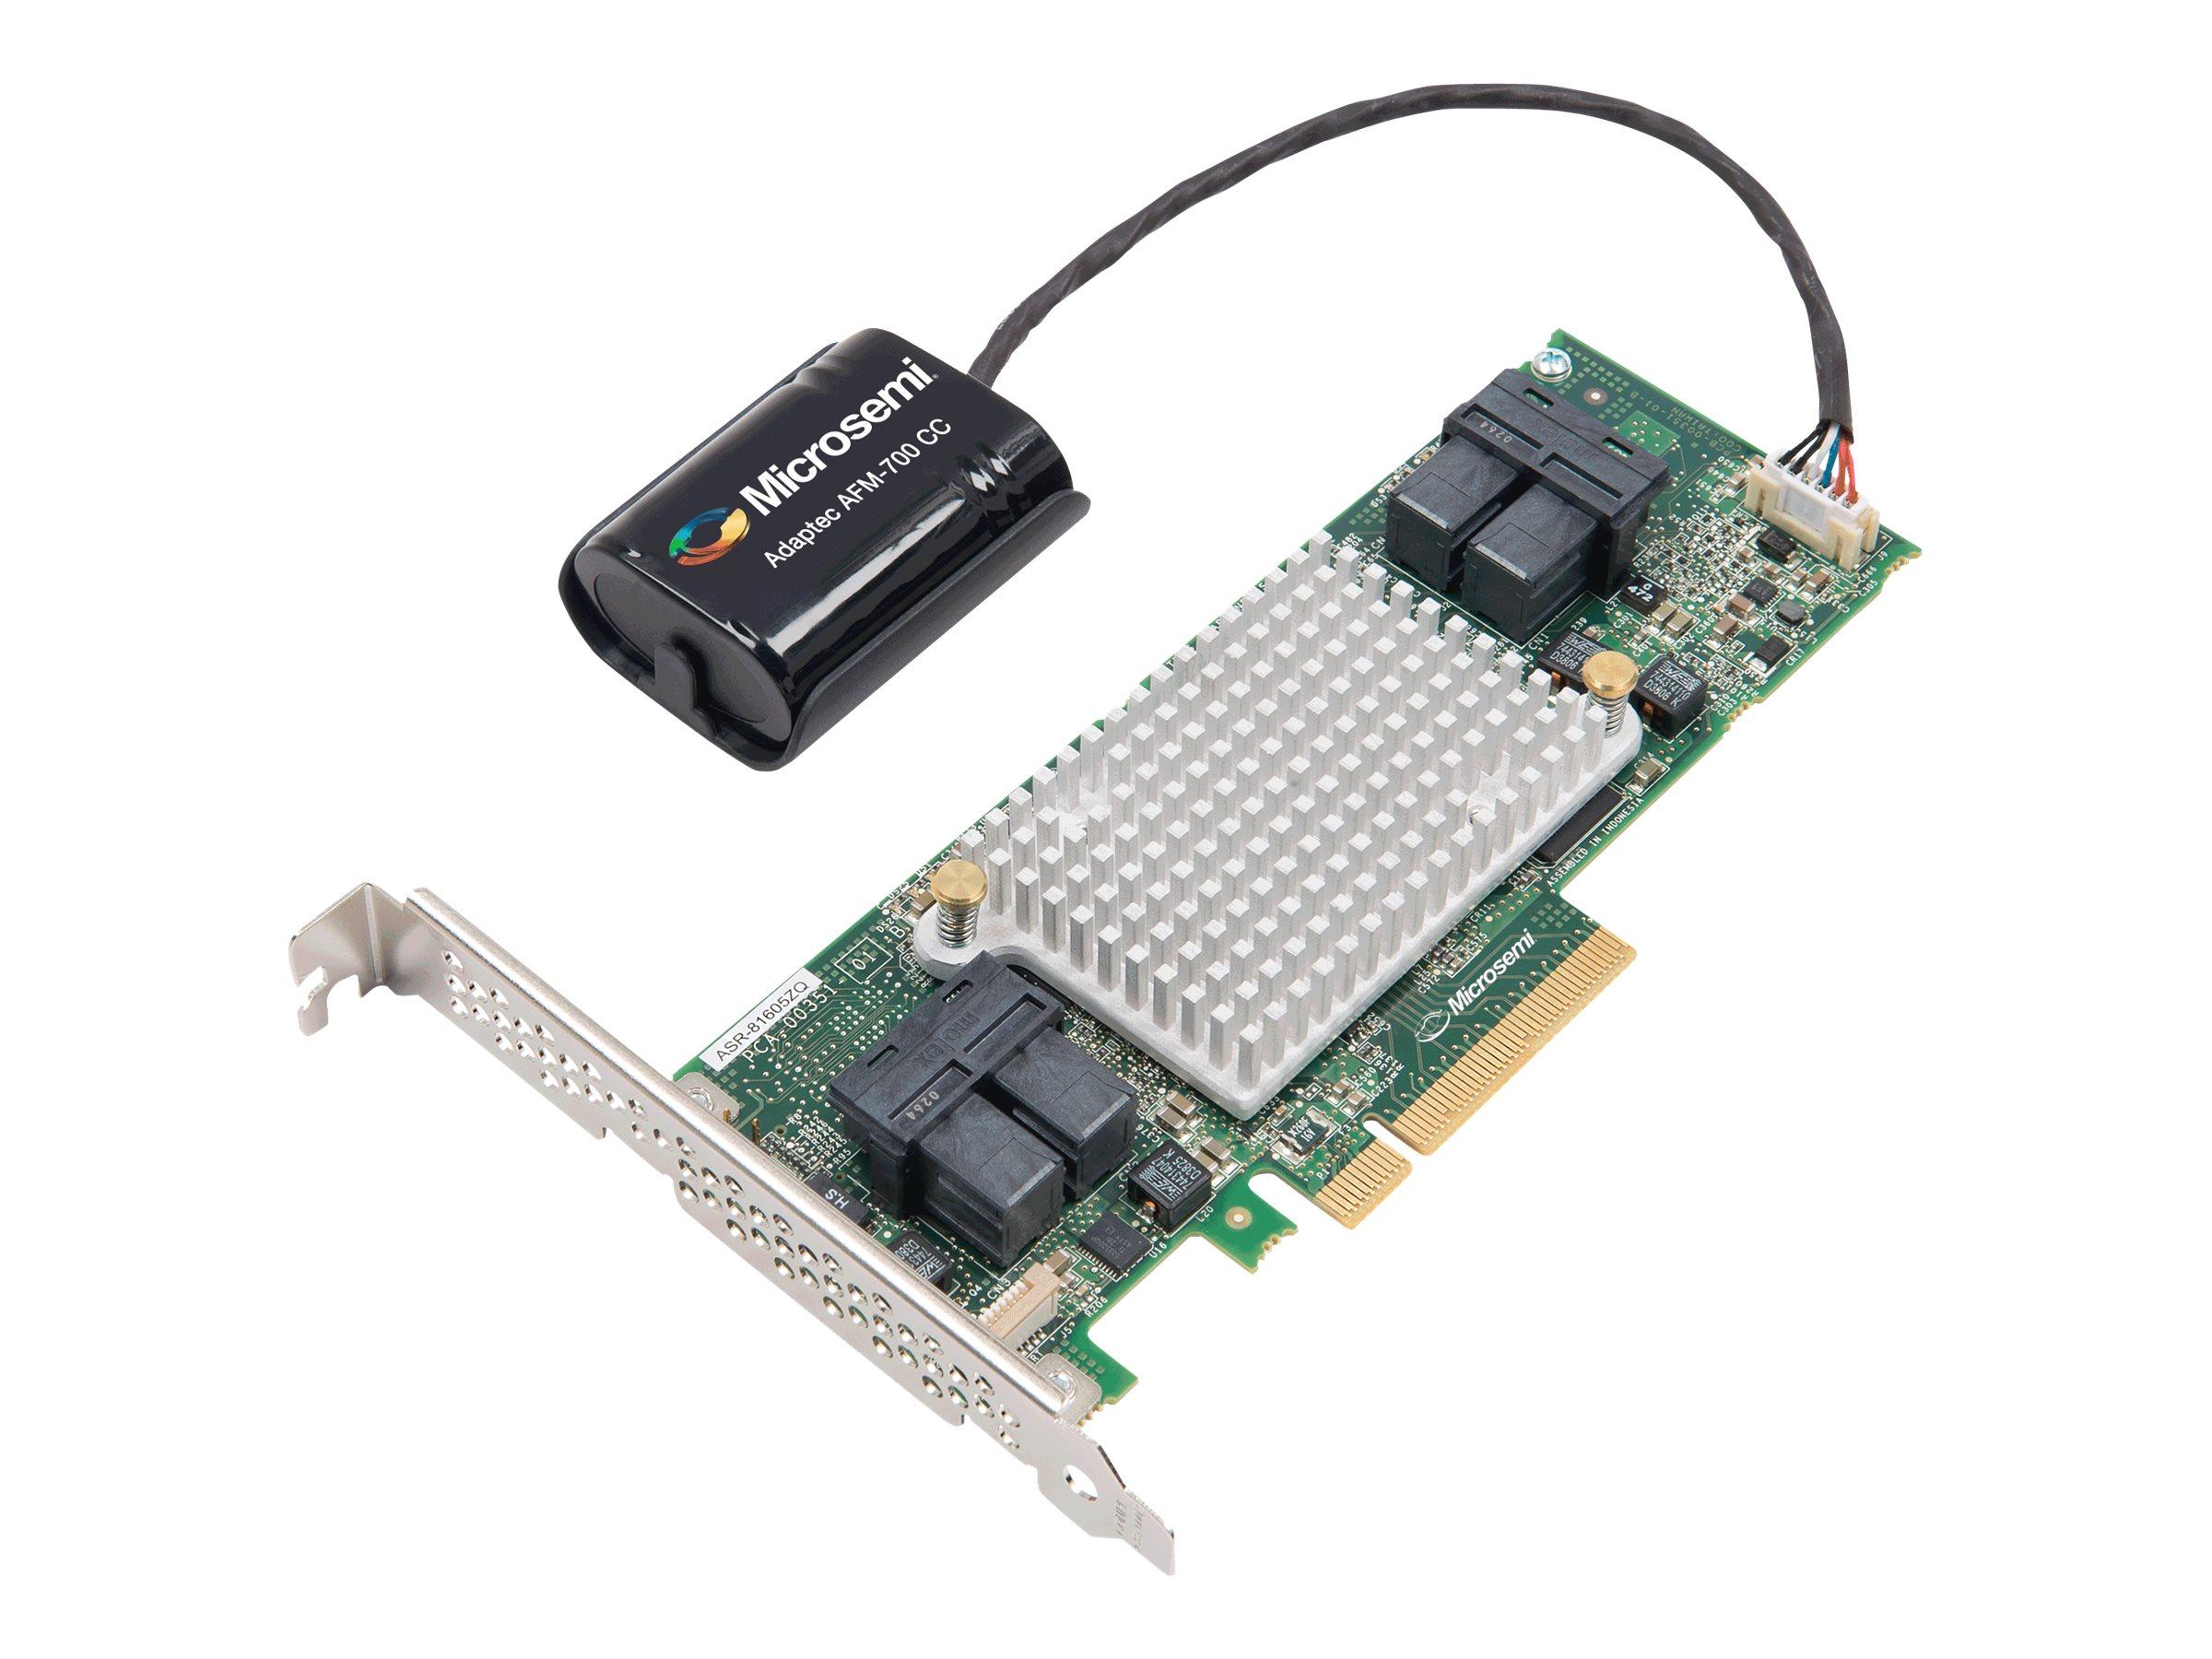 Microchip Adaptec 81605ZQ - storage controller (RAID) - SATA 6Gb/s / SAS 12Gb/s - PCIe 3.0 x8